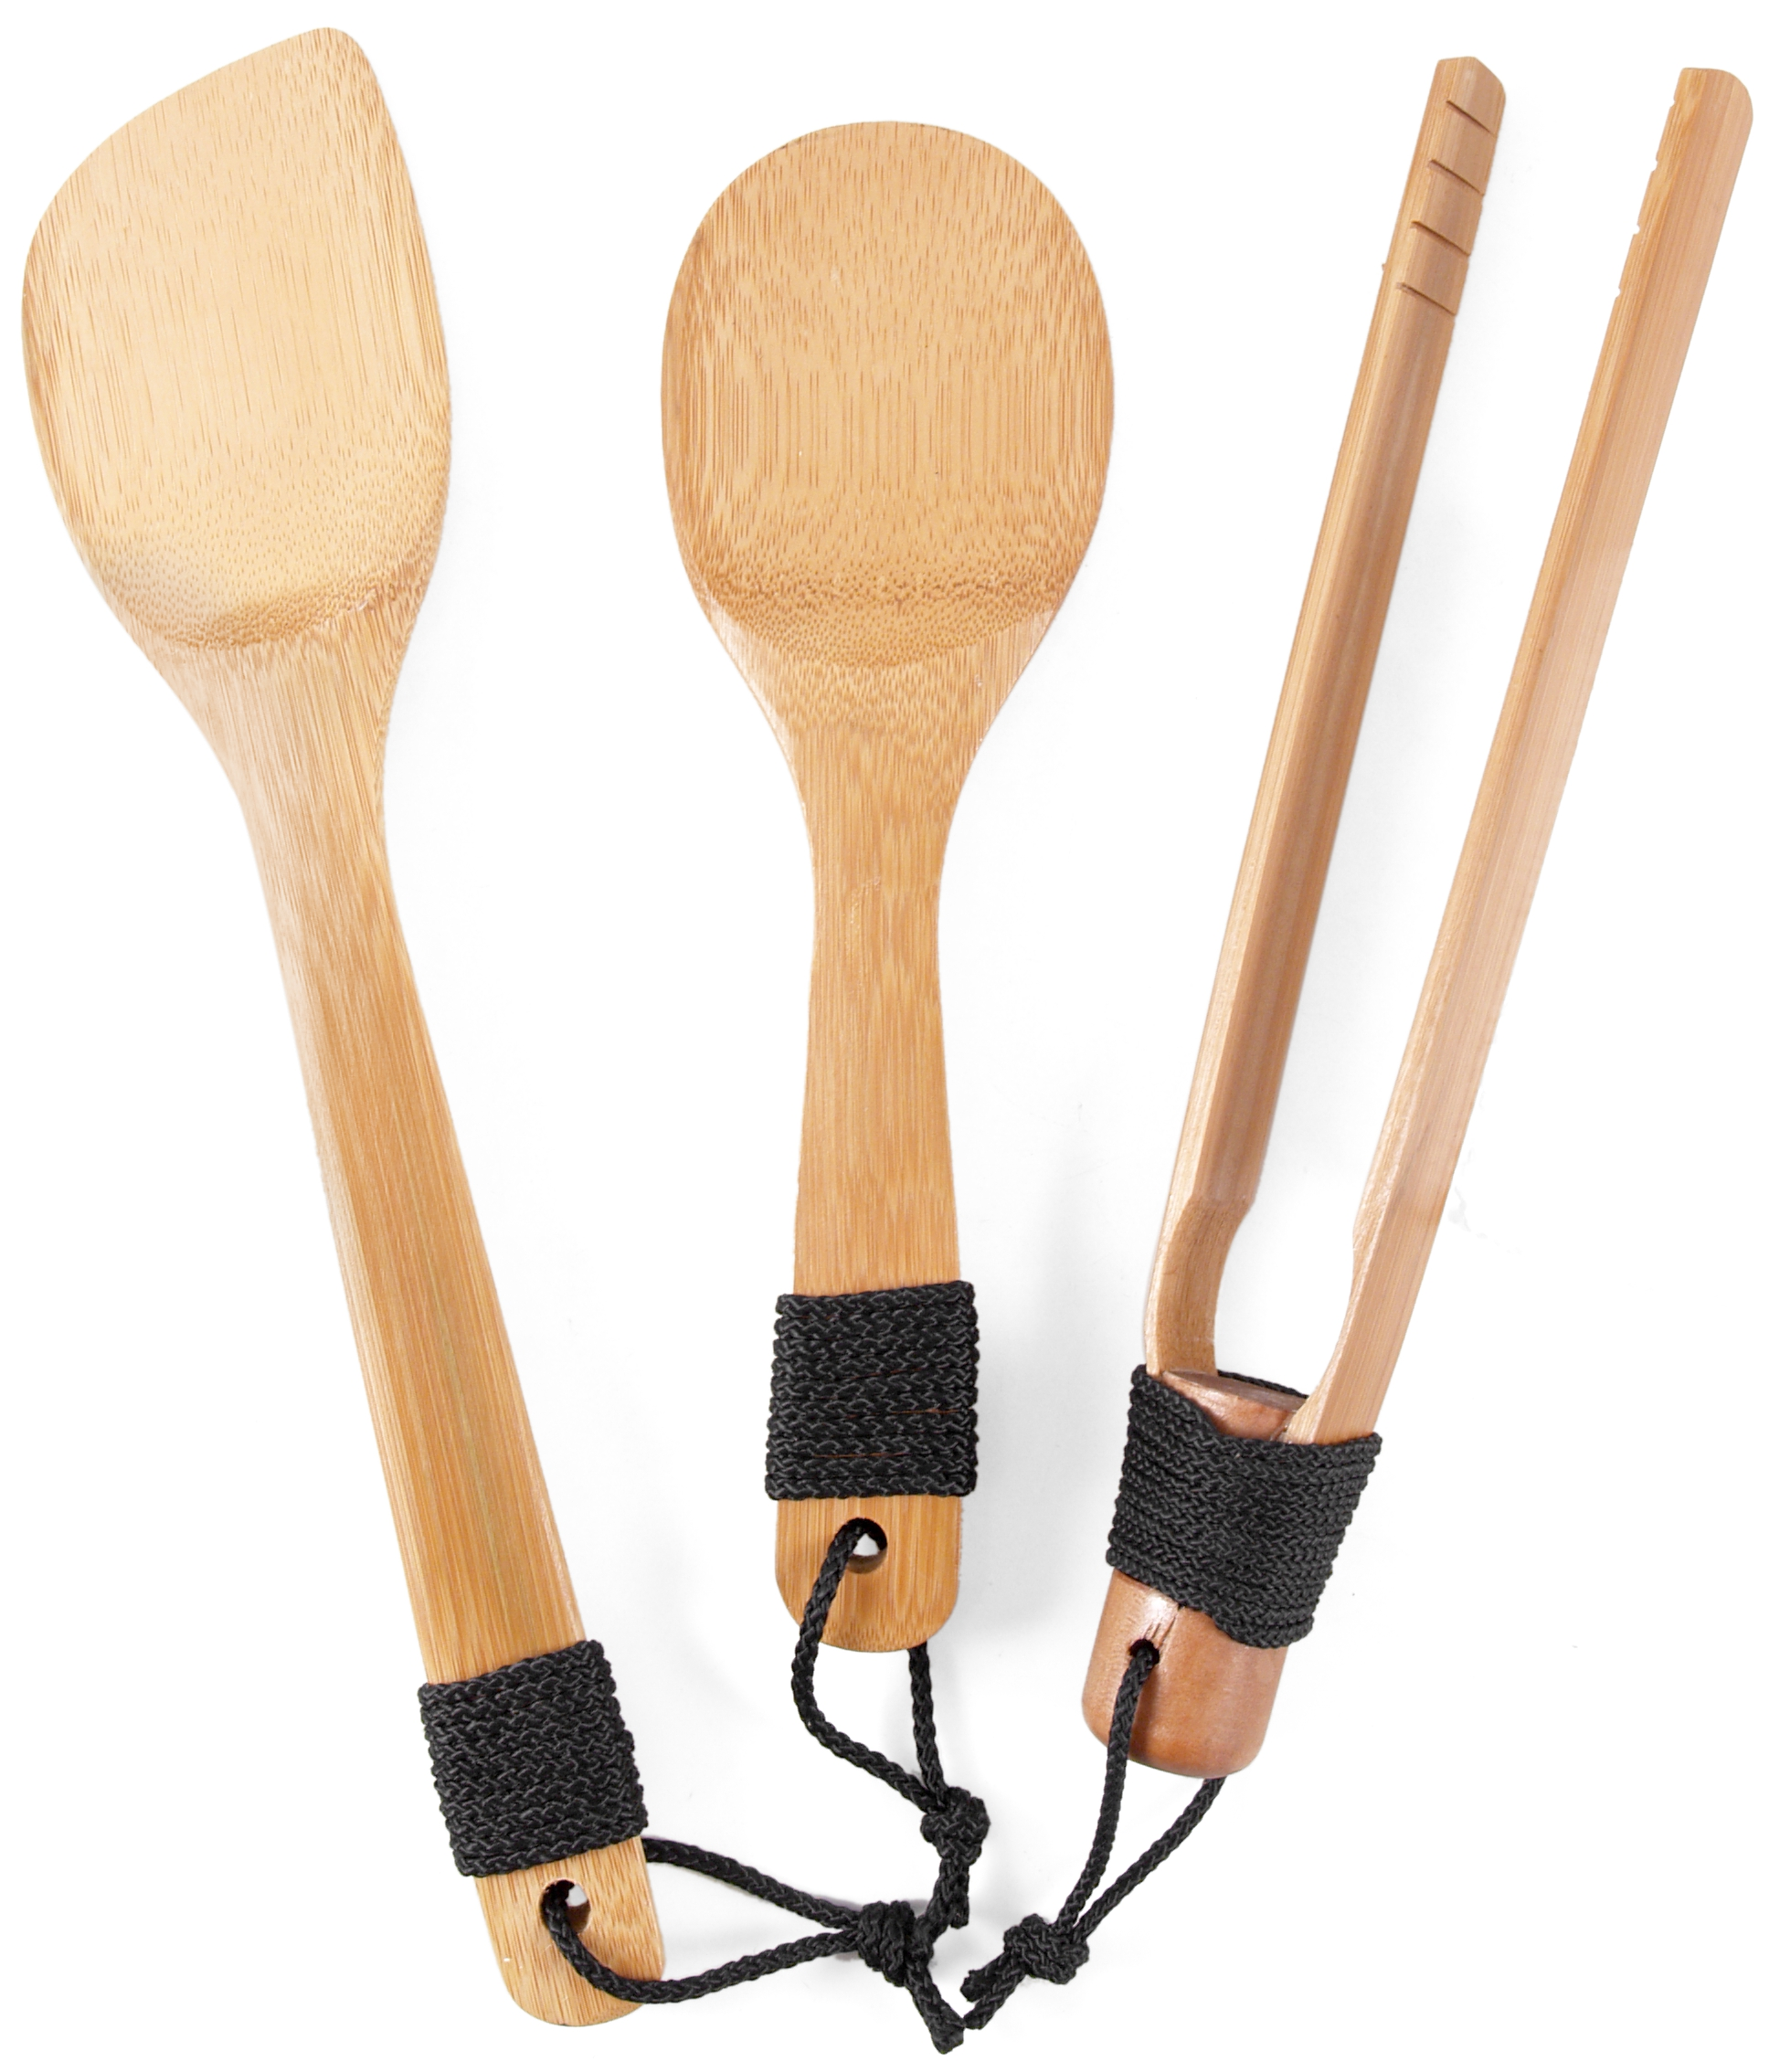 Burnished Bamboo 3 Piece Asian Utensil Set